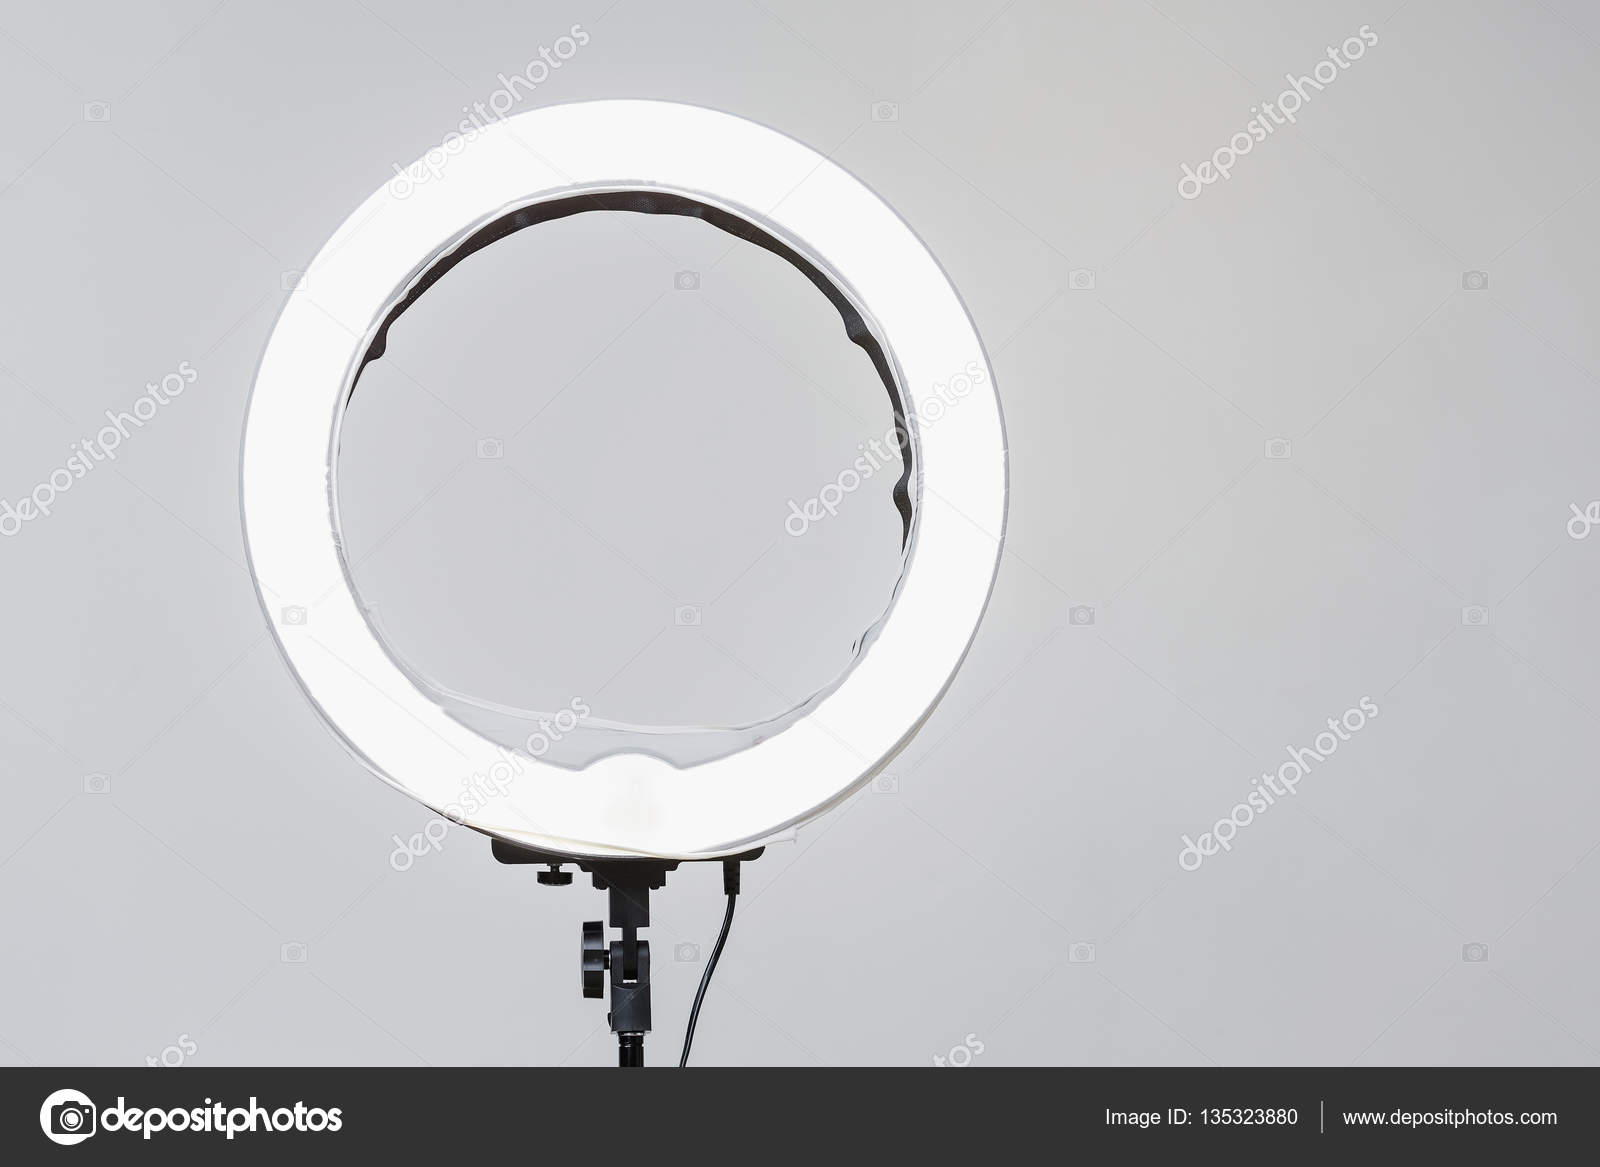 Make Up Licht : Make up licht fresh bmw e lci sonnenblende make up leuchte